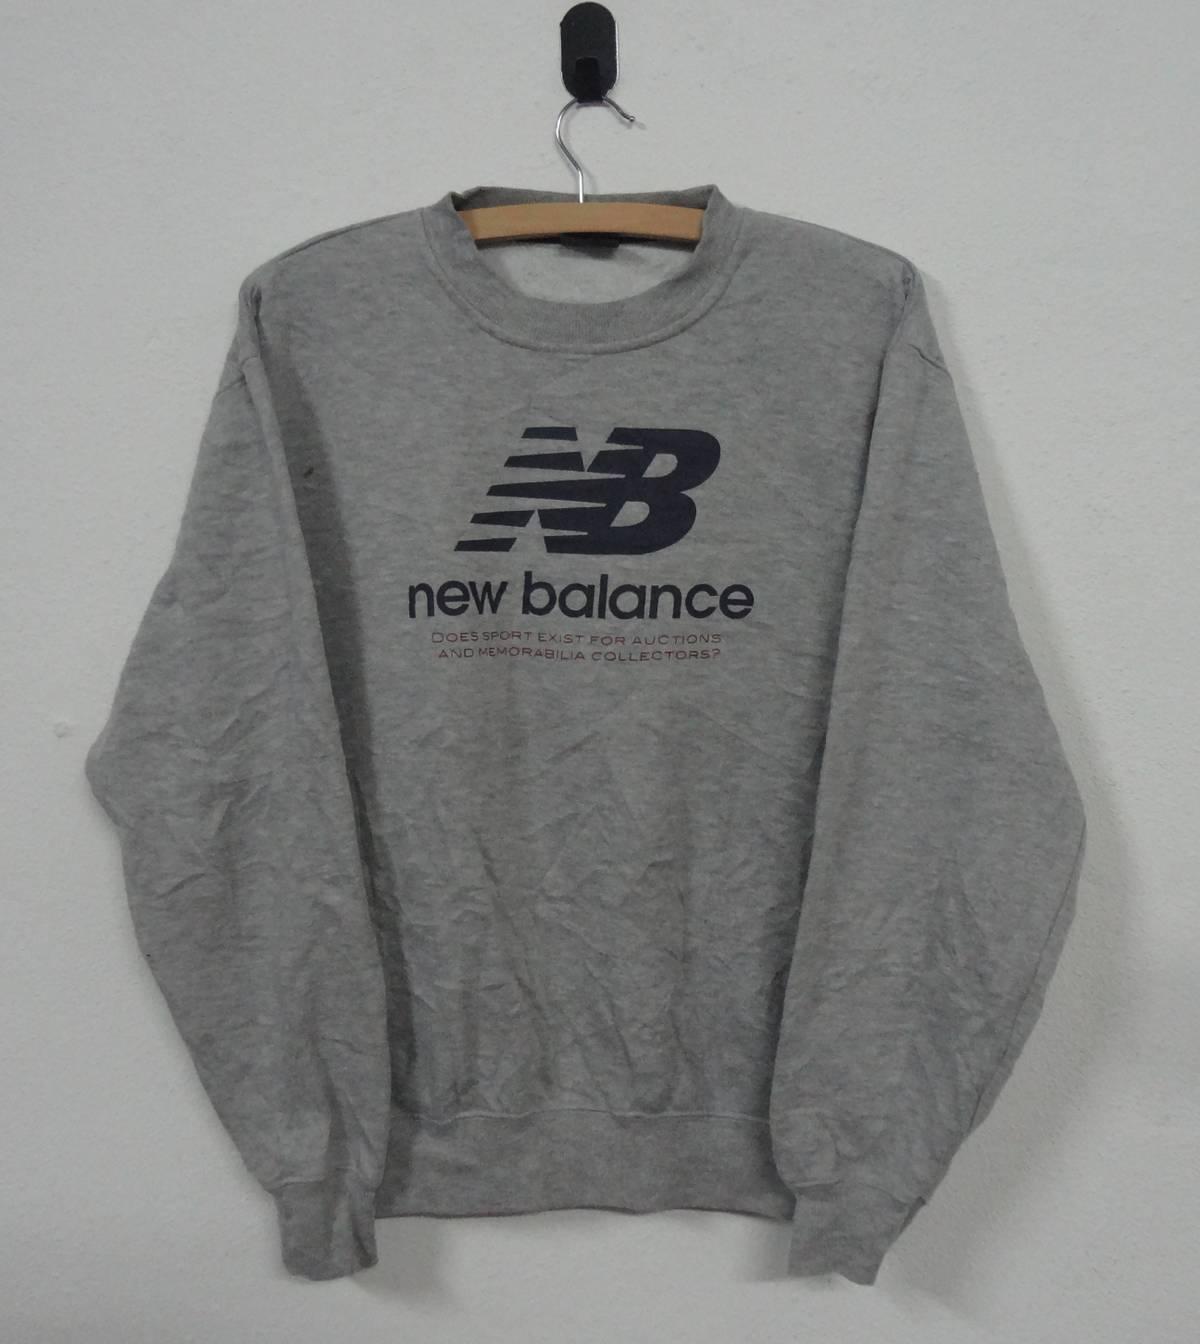 90's New Balance Sweatshirt Gray NB Jumper Pullover Medium Size